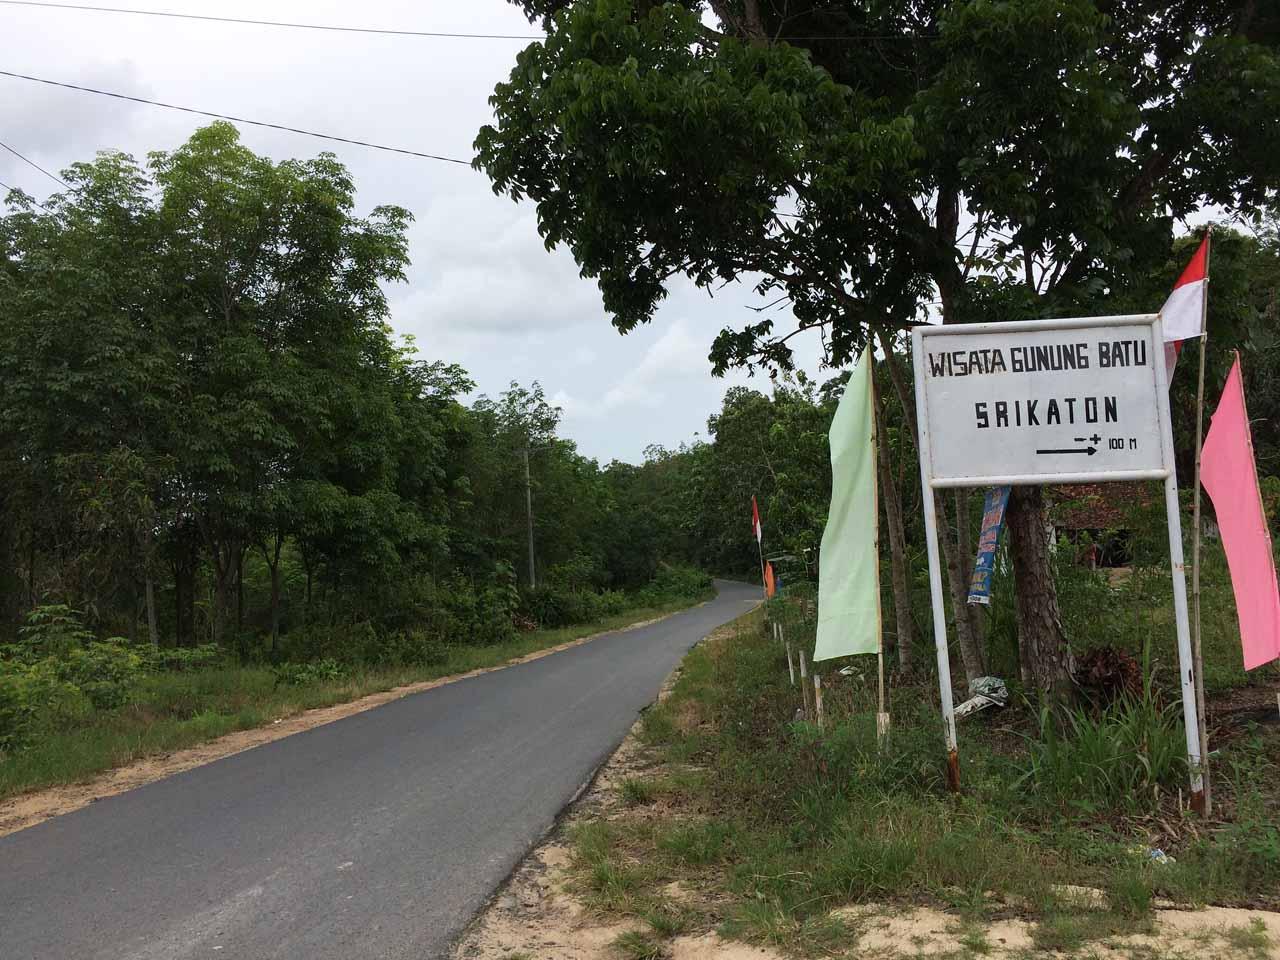 Plang Wisata Gunung Batu Srikaton - Yopie Pangkey